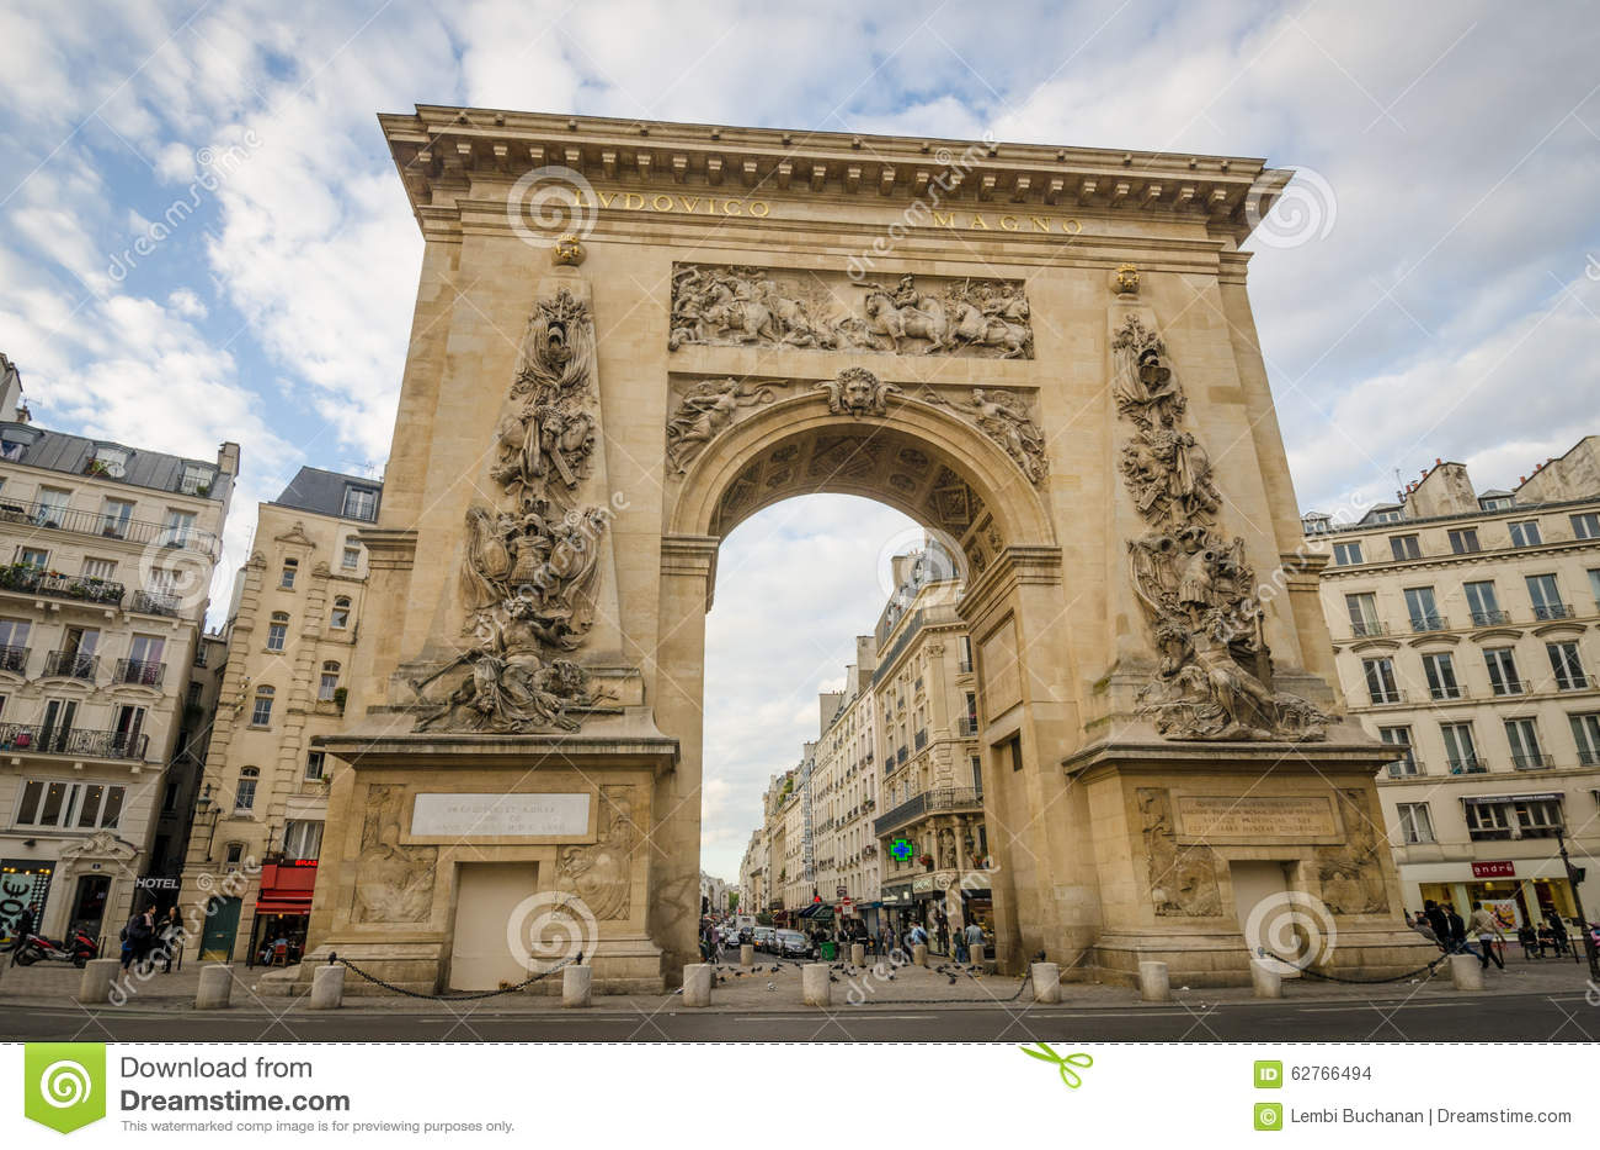 porte saint denis in paris looking down rue saint denis editorial stock image image 62766494. Black Bedroom Furniture Sets. Home Design Ideas